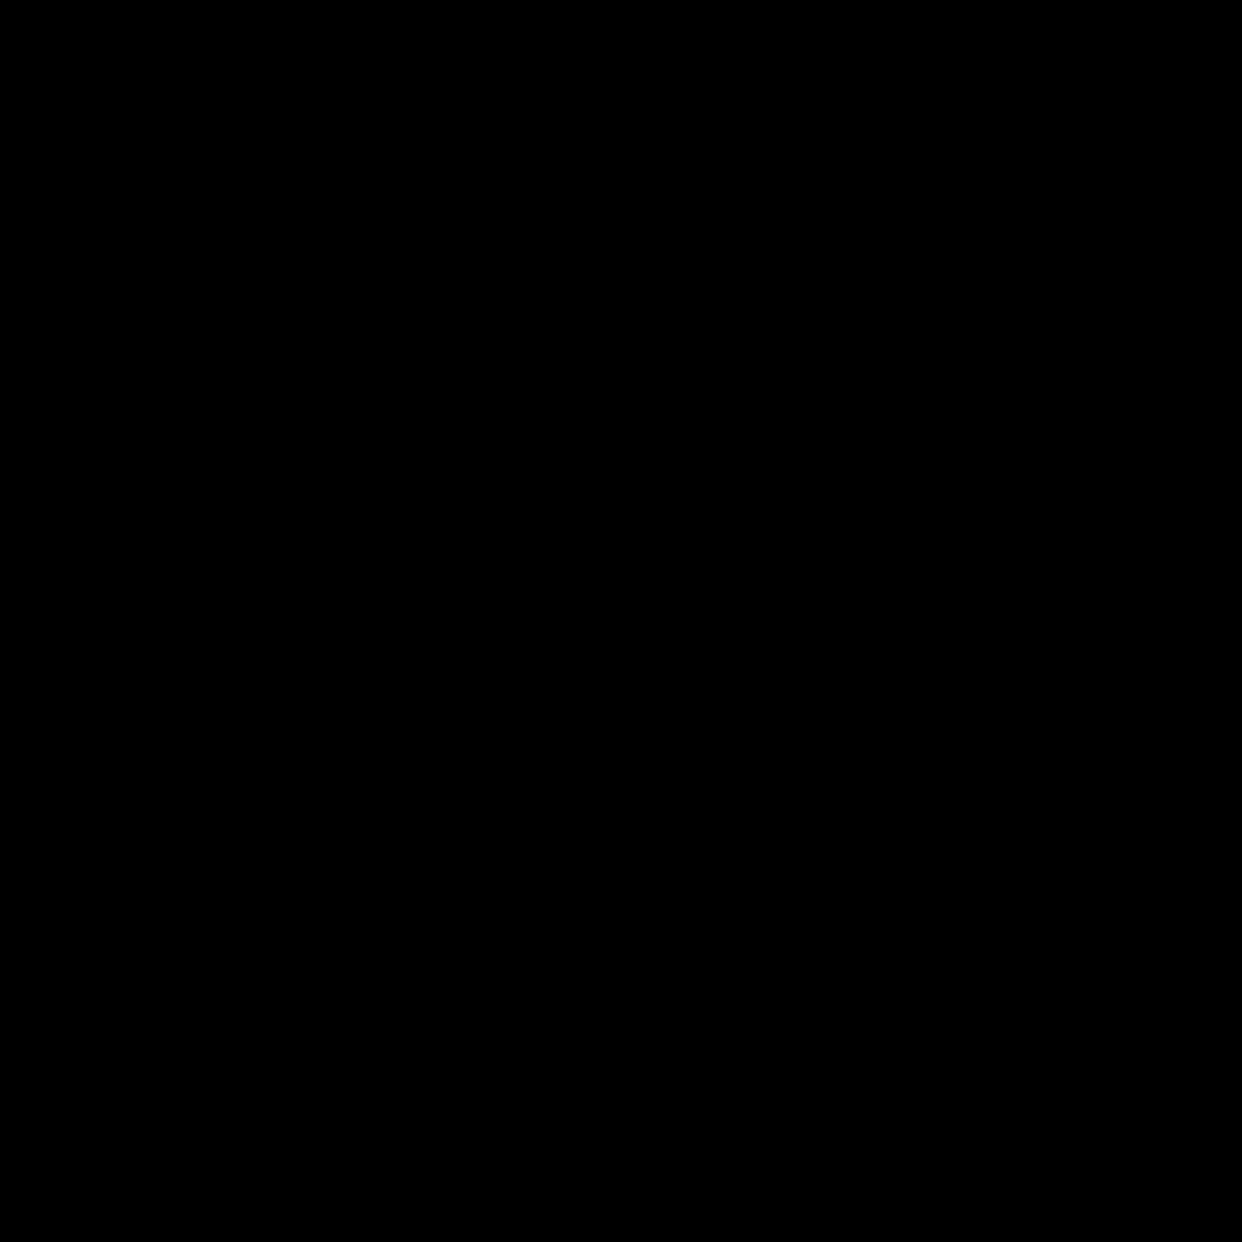 file1-7